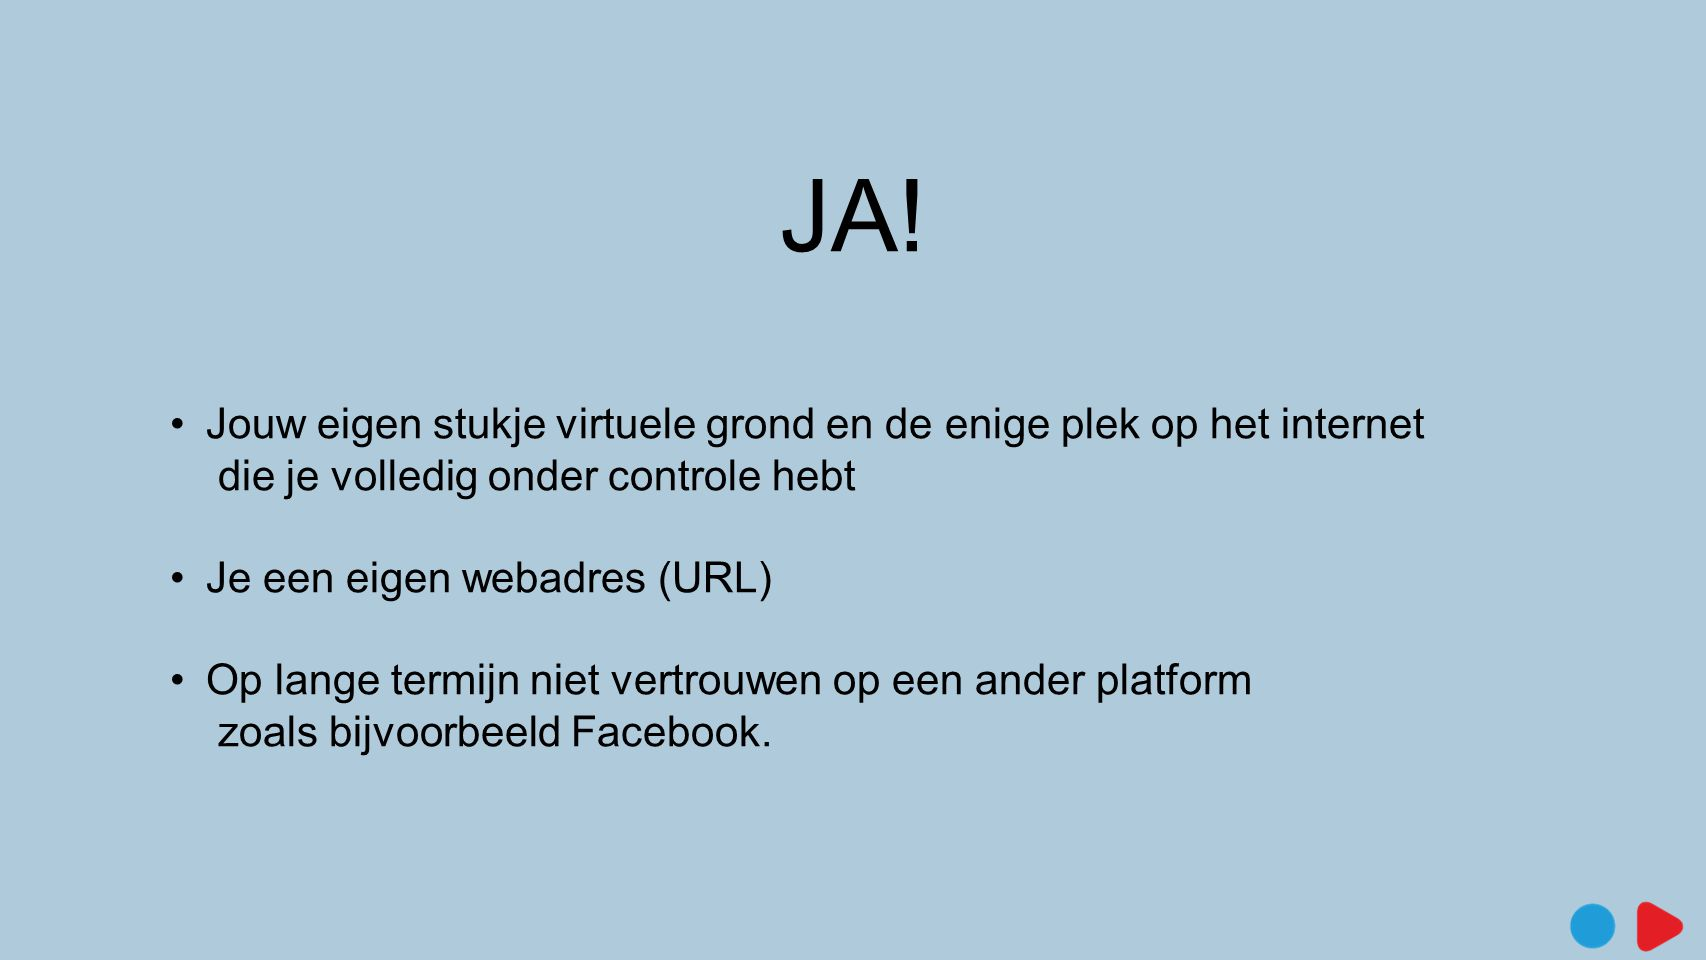 JA! Jouw eigen stukje virtuele grond en de enige plek op het internet die je volledig onder controle hebt.